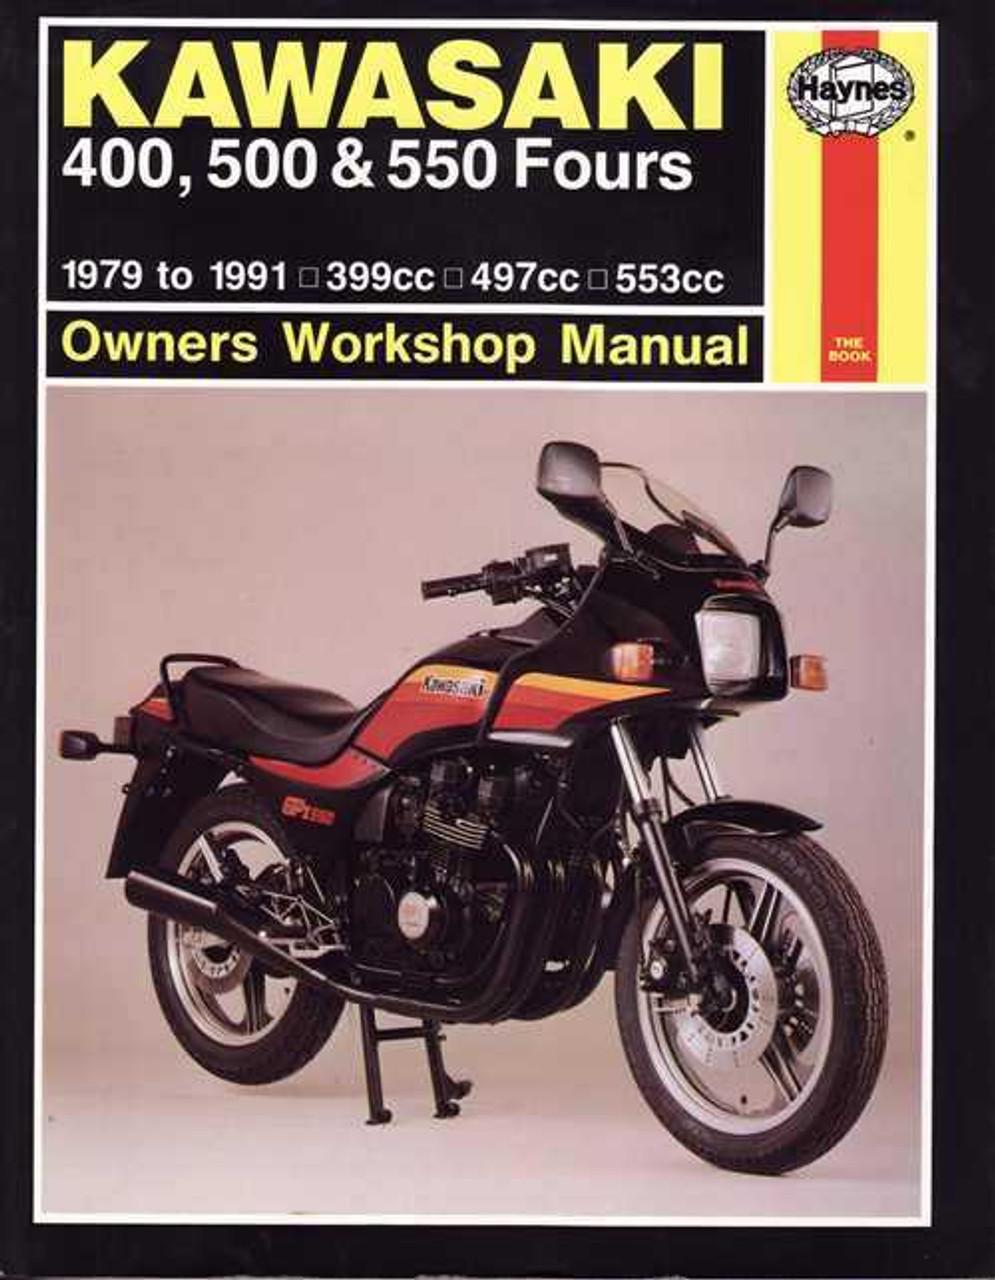 triumph trophy 900 1200 service repair workshop manual 1991 2004